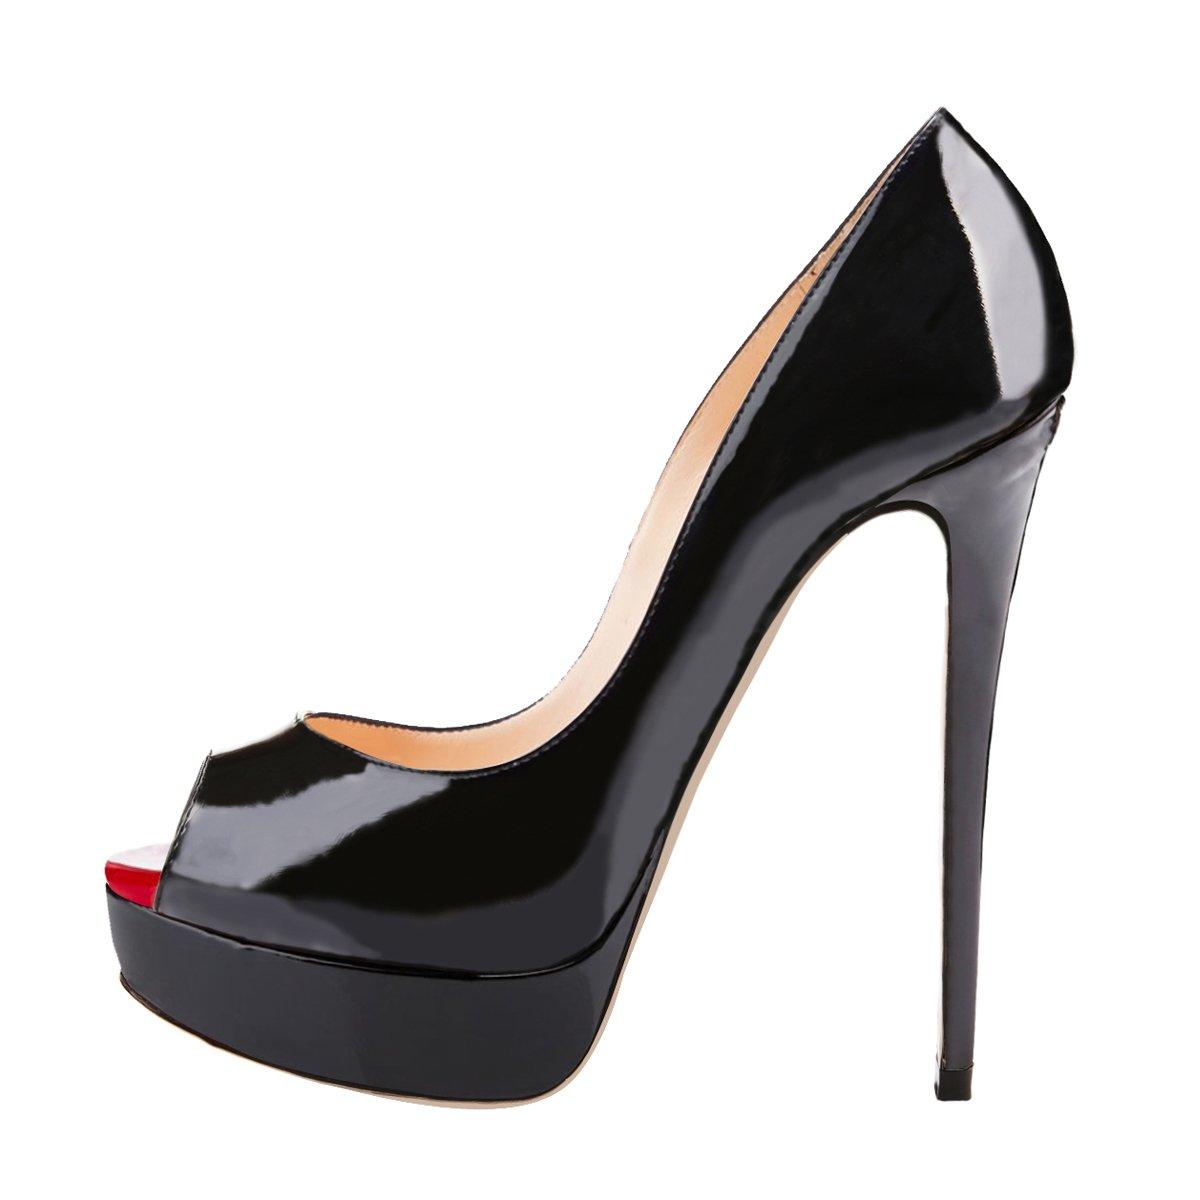 onlymaker Women's Sexy High Heels Peep Toe Slip On Platform Pumps Stiletto Dress Party Wedding Shoes Black US10